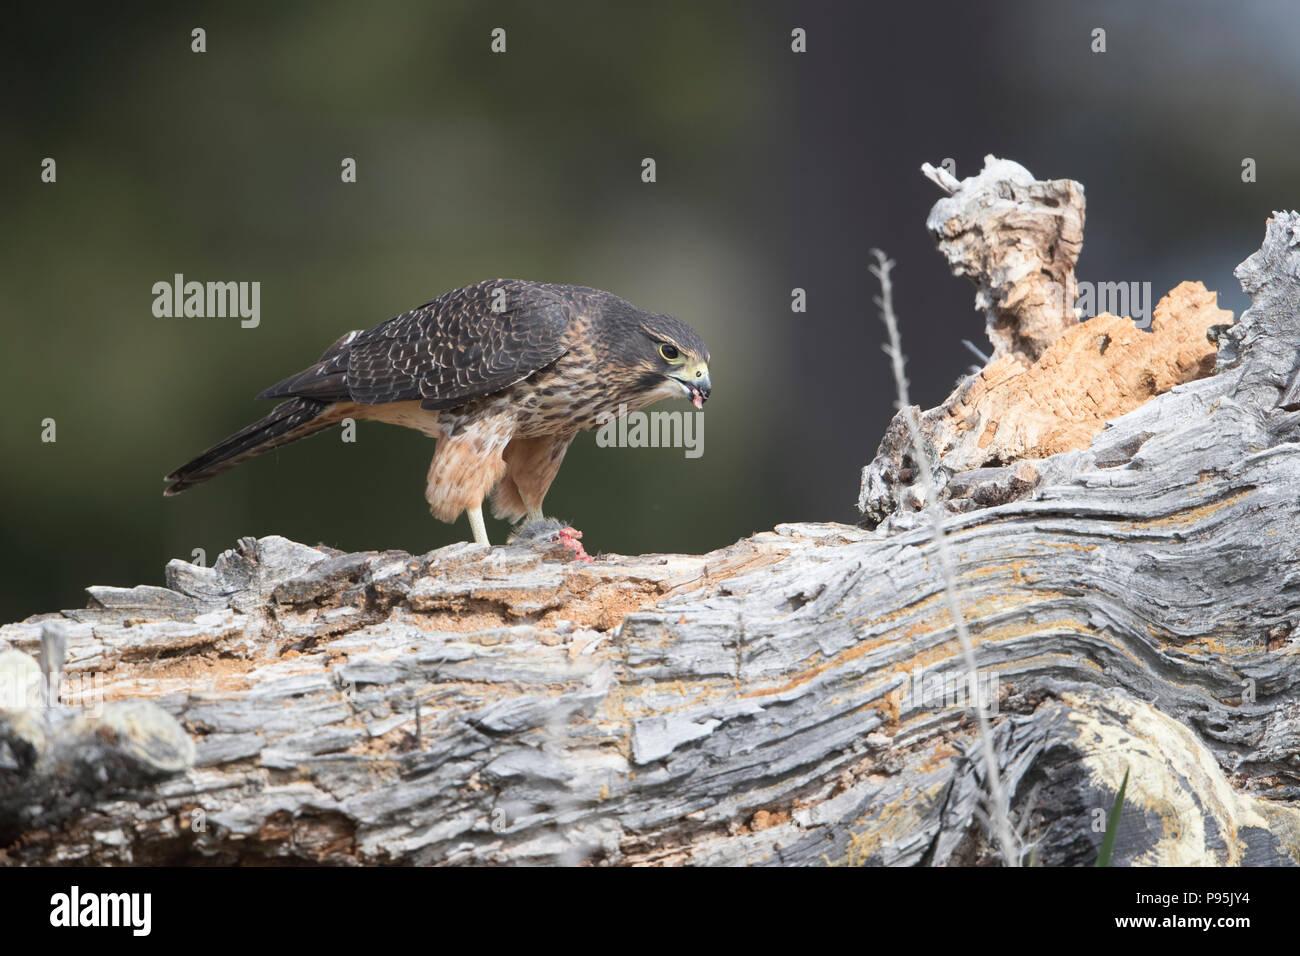 New Zealand Falcon, eating prey, South Island, New Zealand - Stock Image